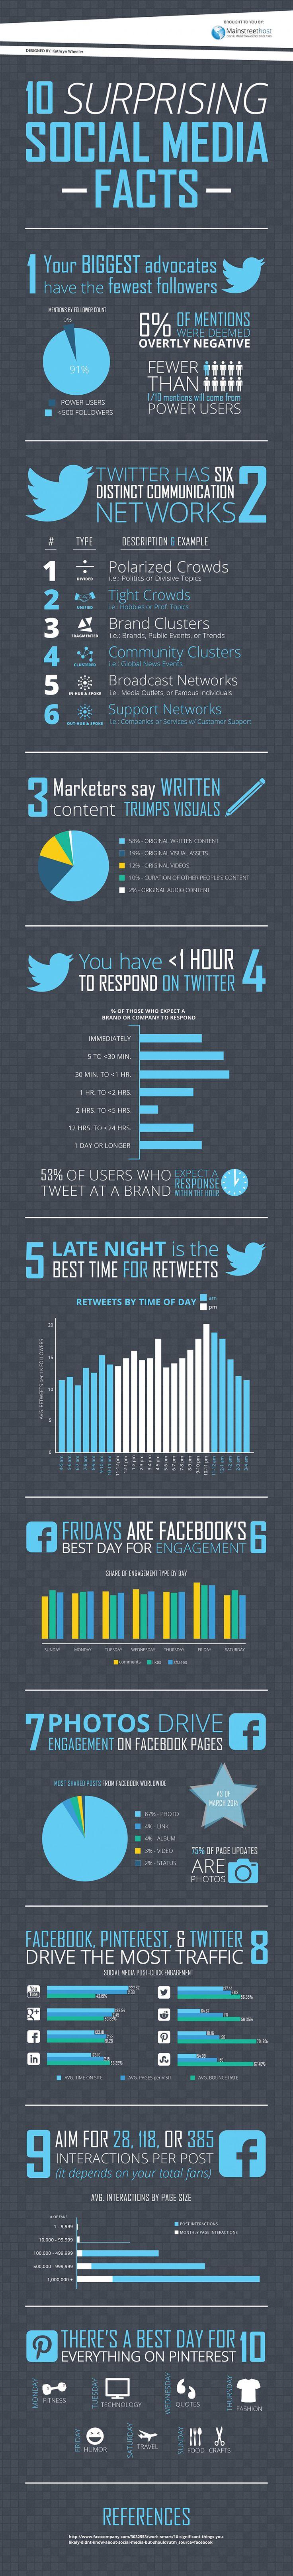 10 Surprising Social Media Facts & Stats #infographic #socialmedia #statistics